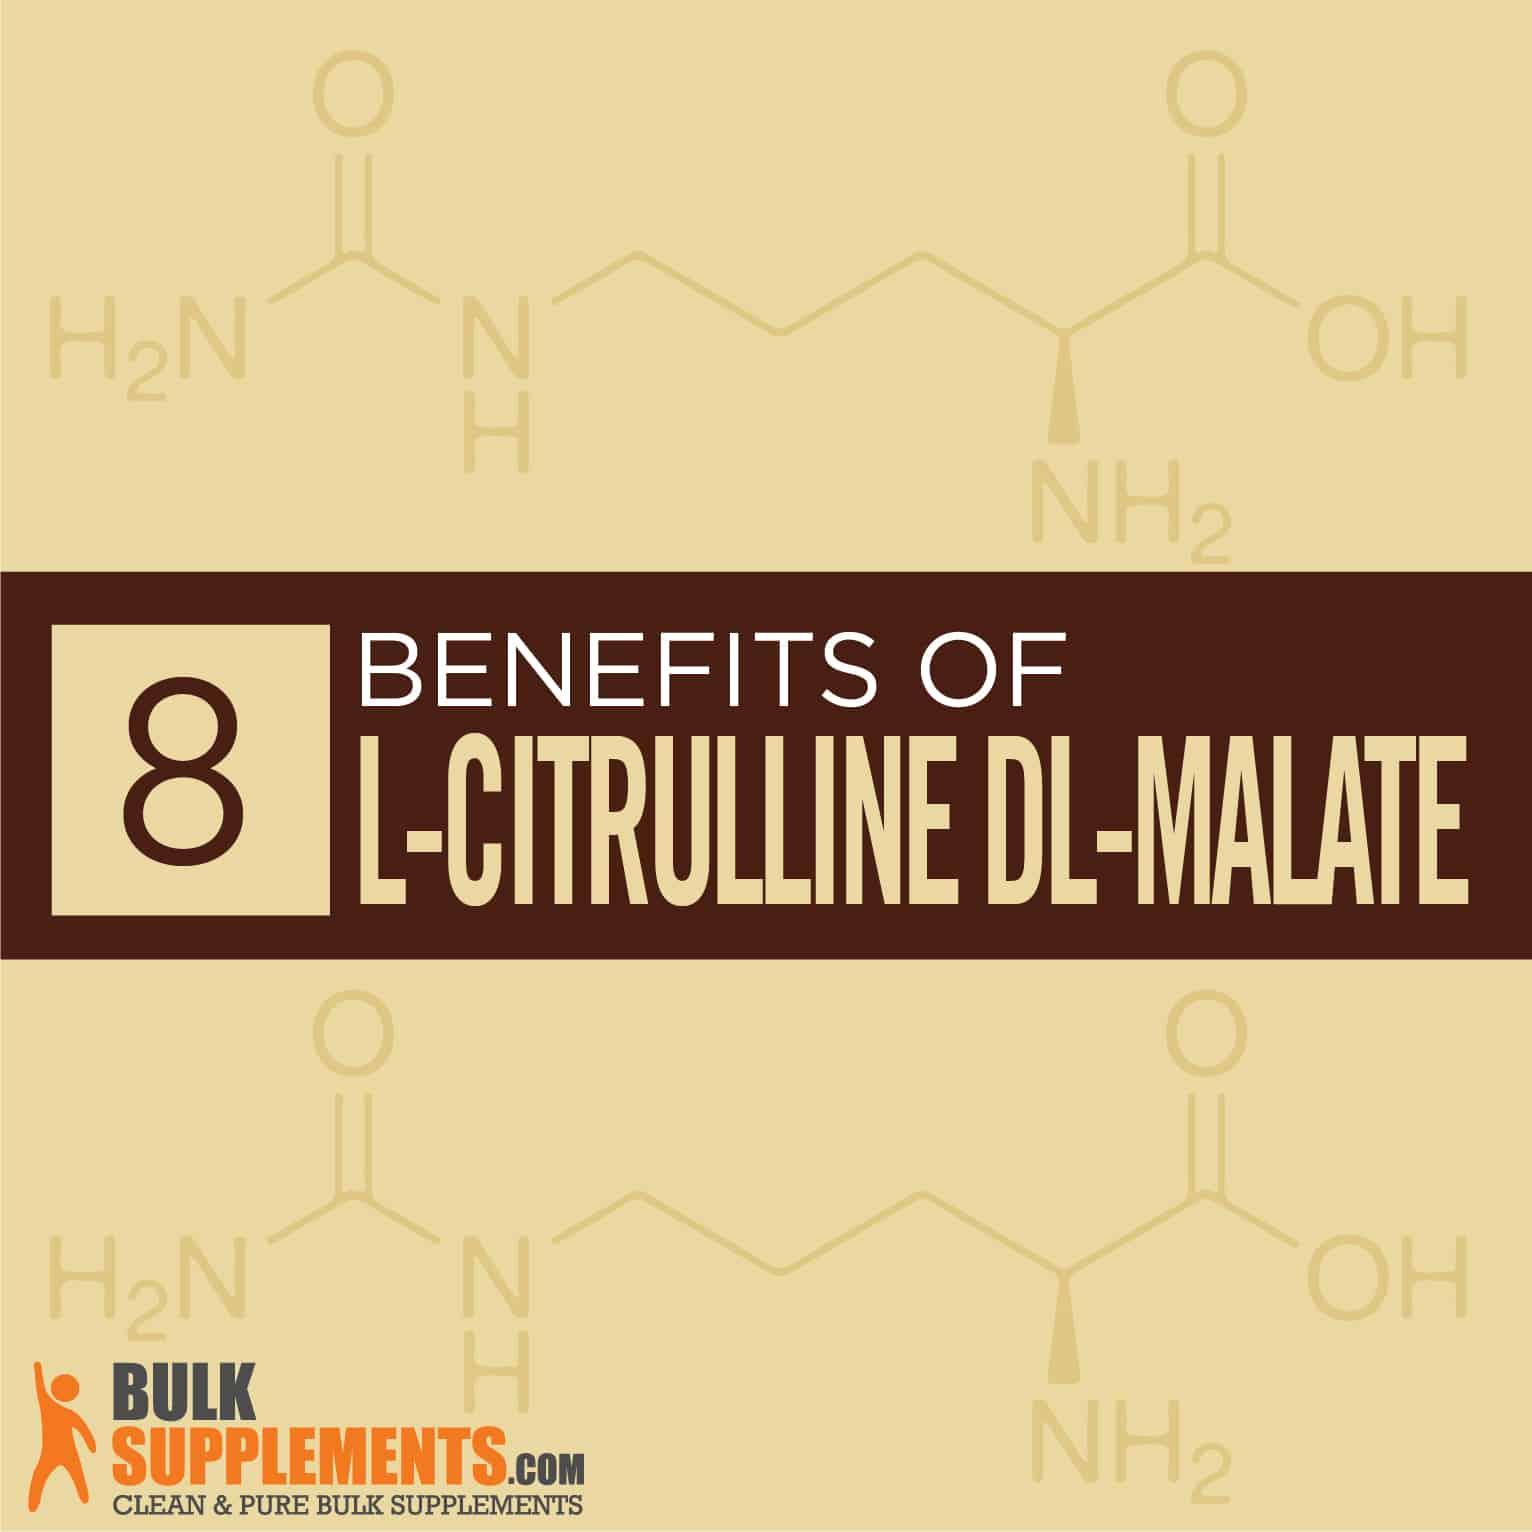 L-Citrulline DL-Malate